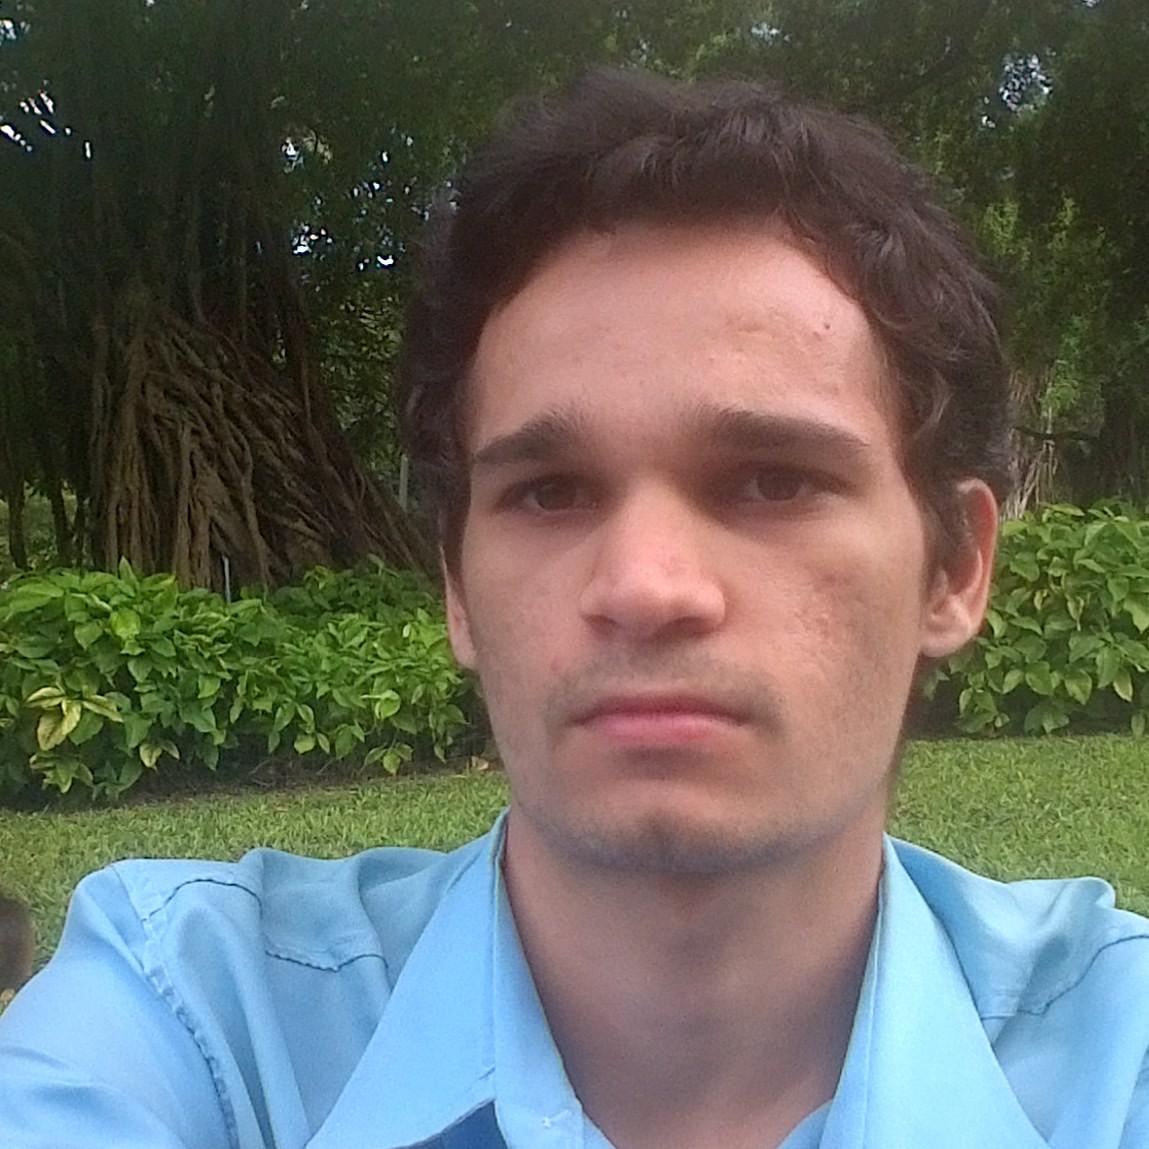 Diego Pacheco Macedo